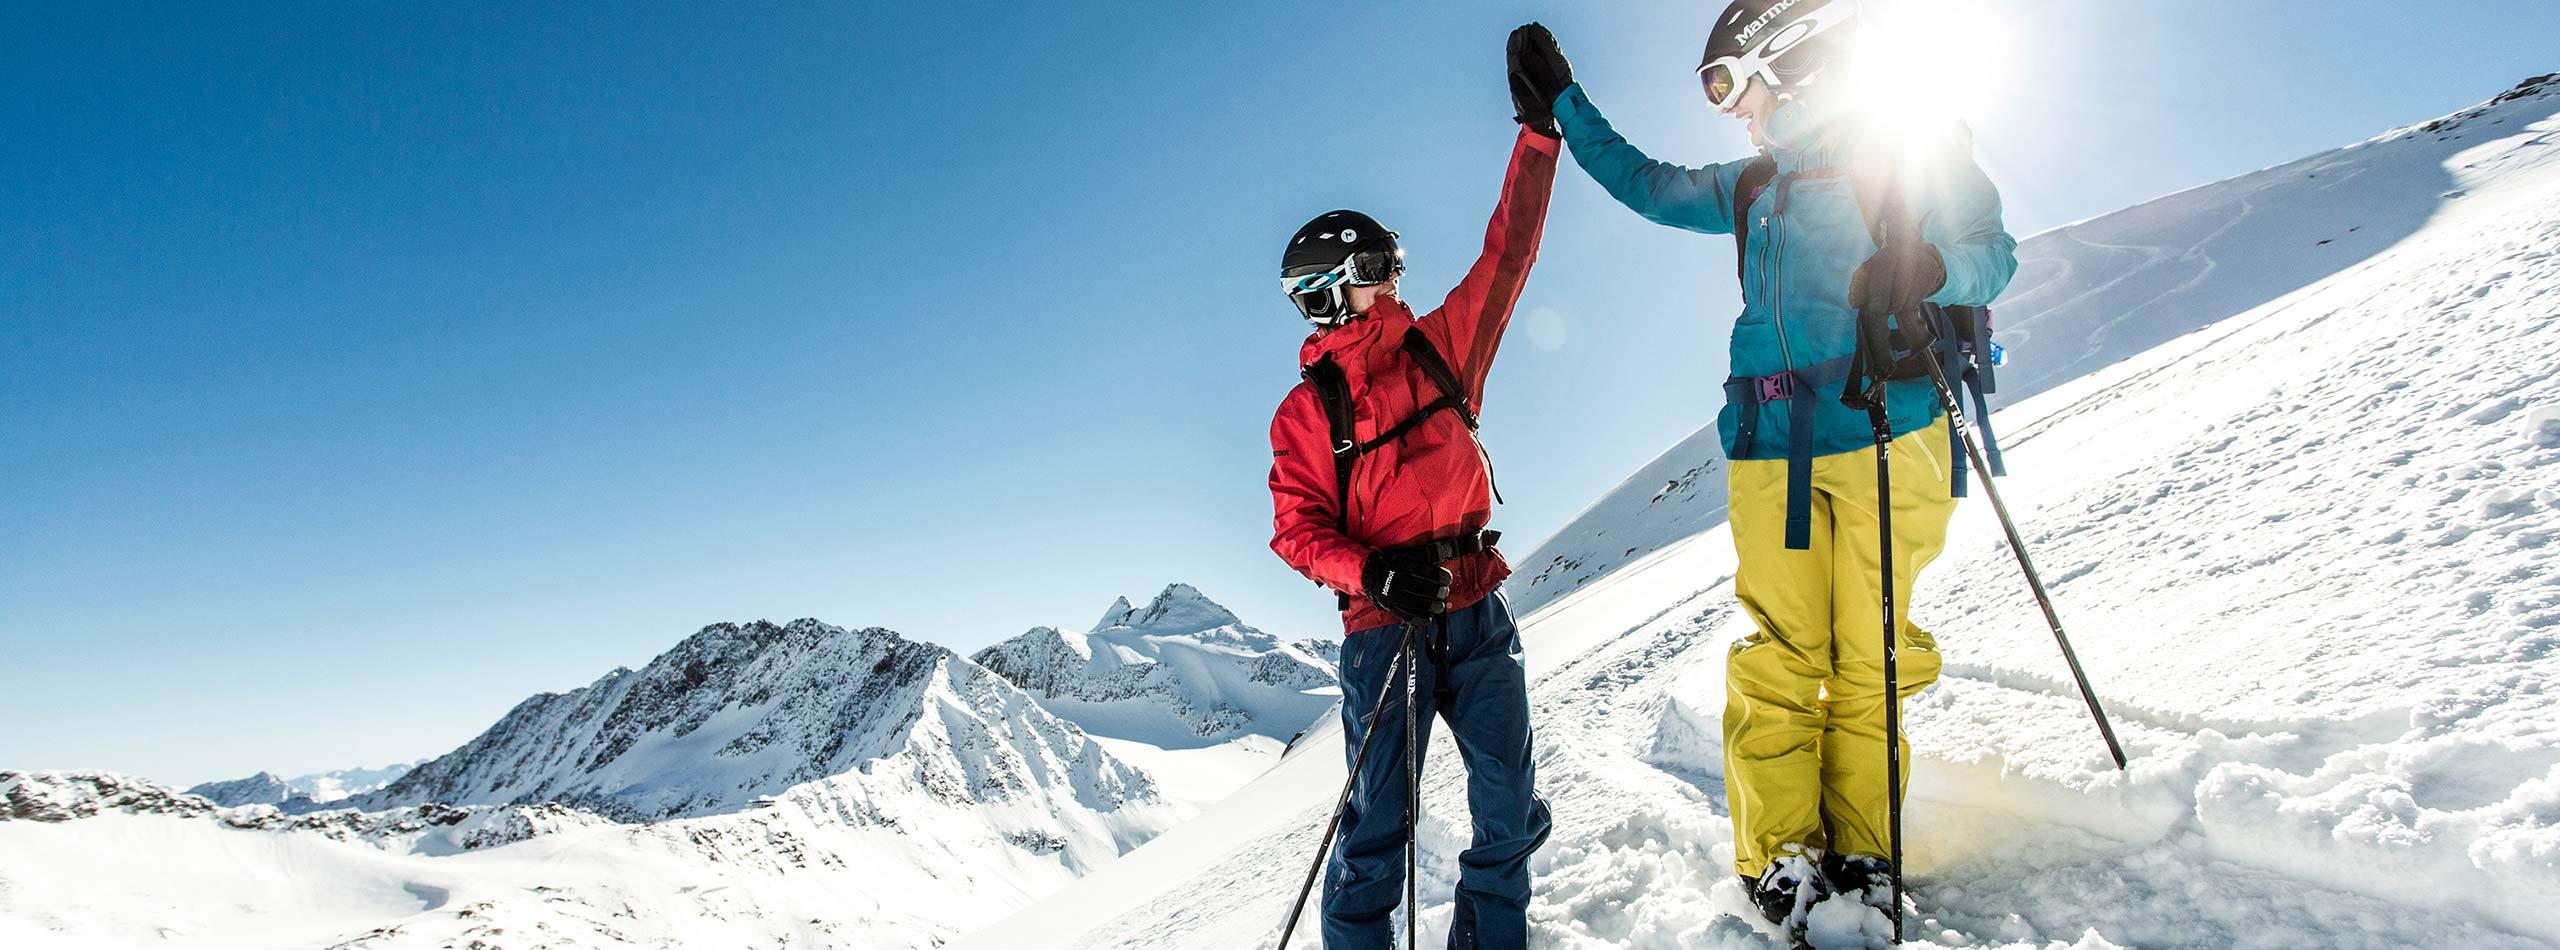 Skiurlaub im 4-Sterne-Hotel Happy Stubai Gletscherski